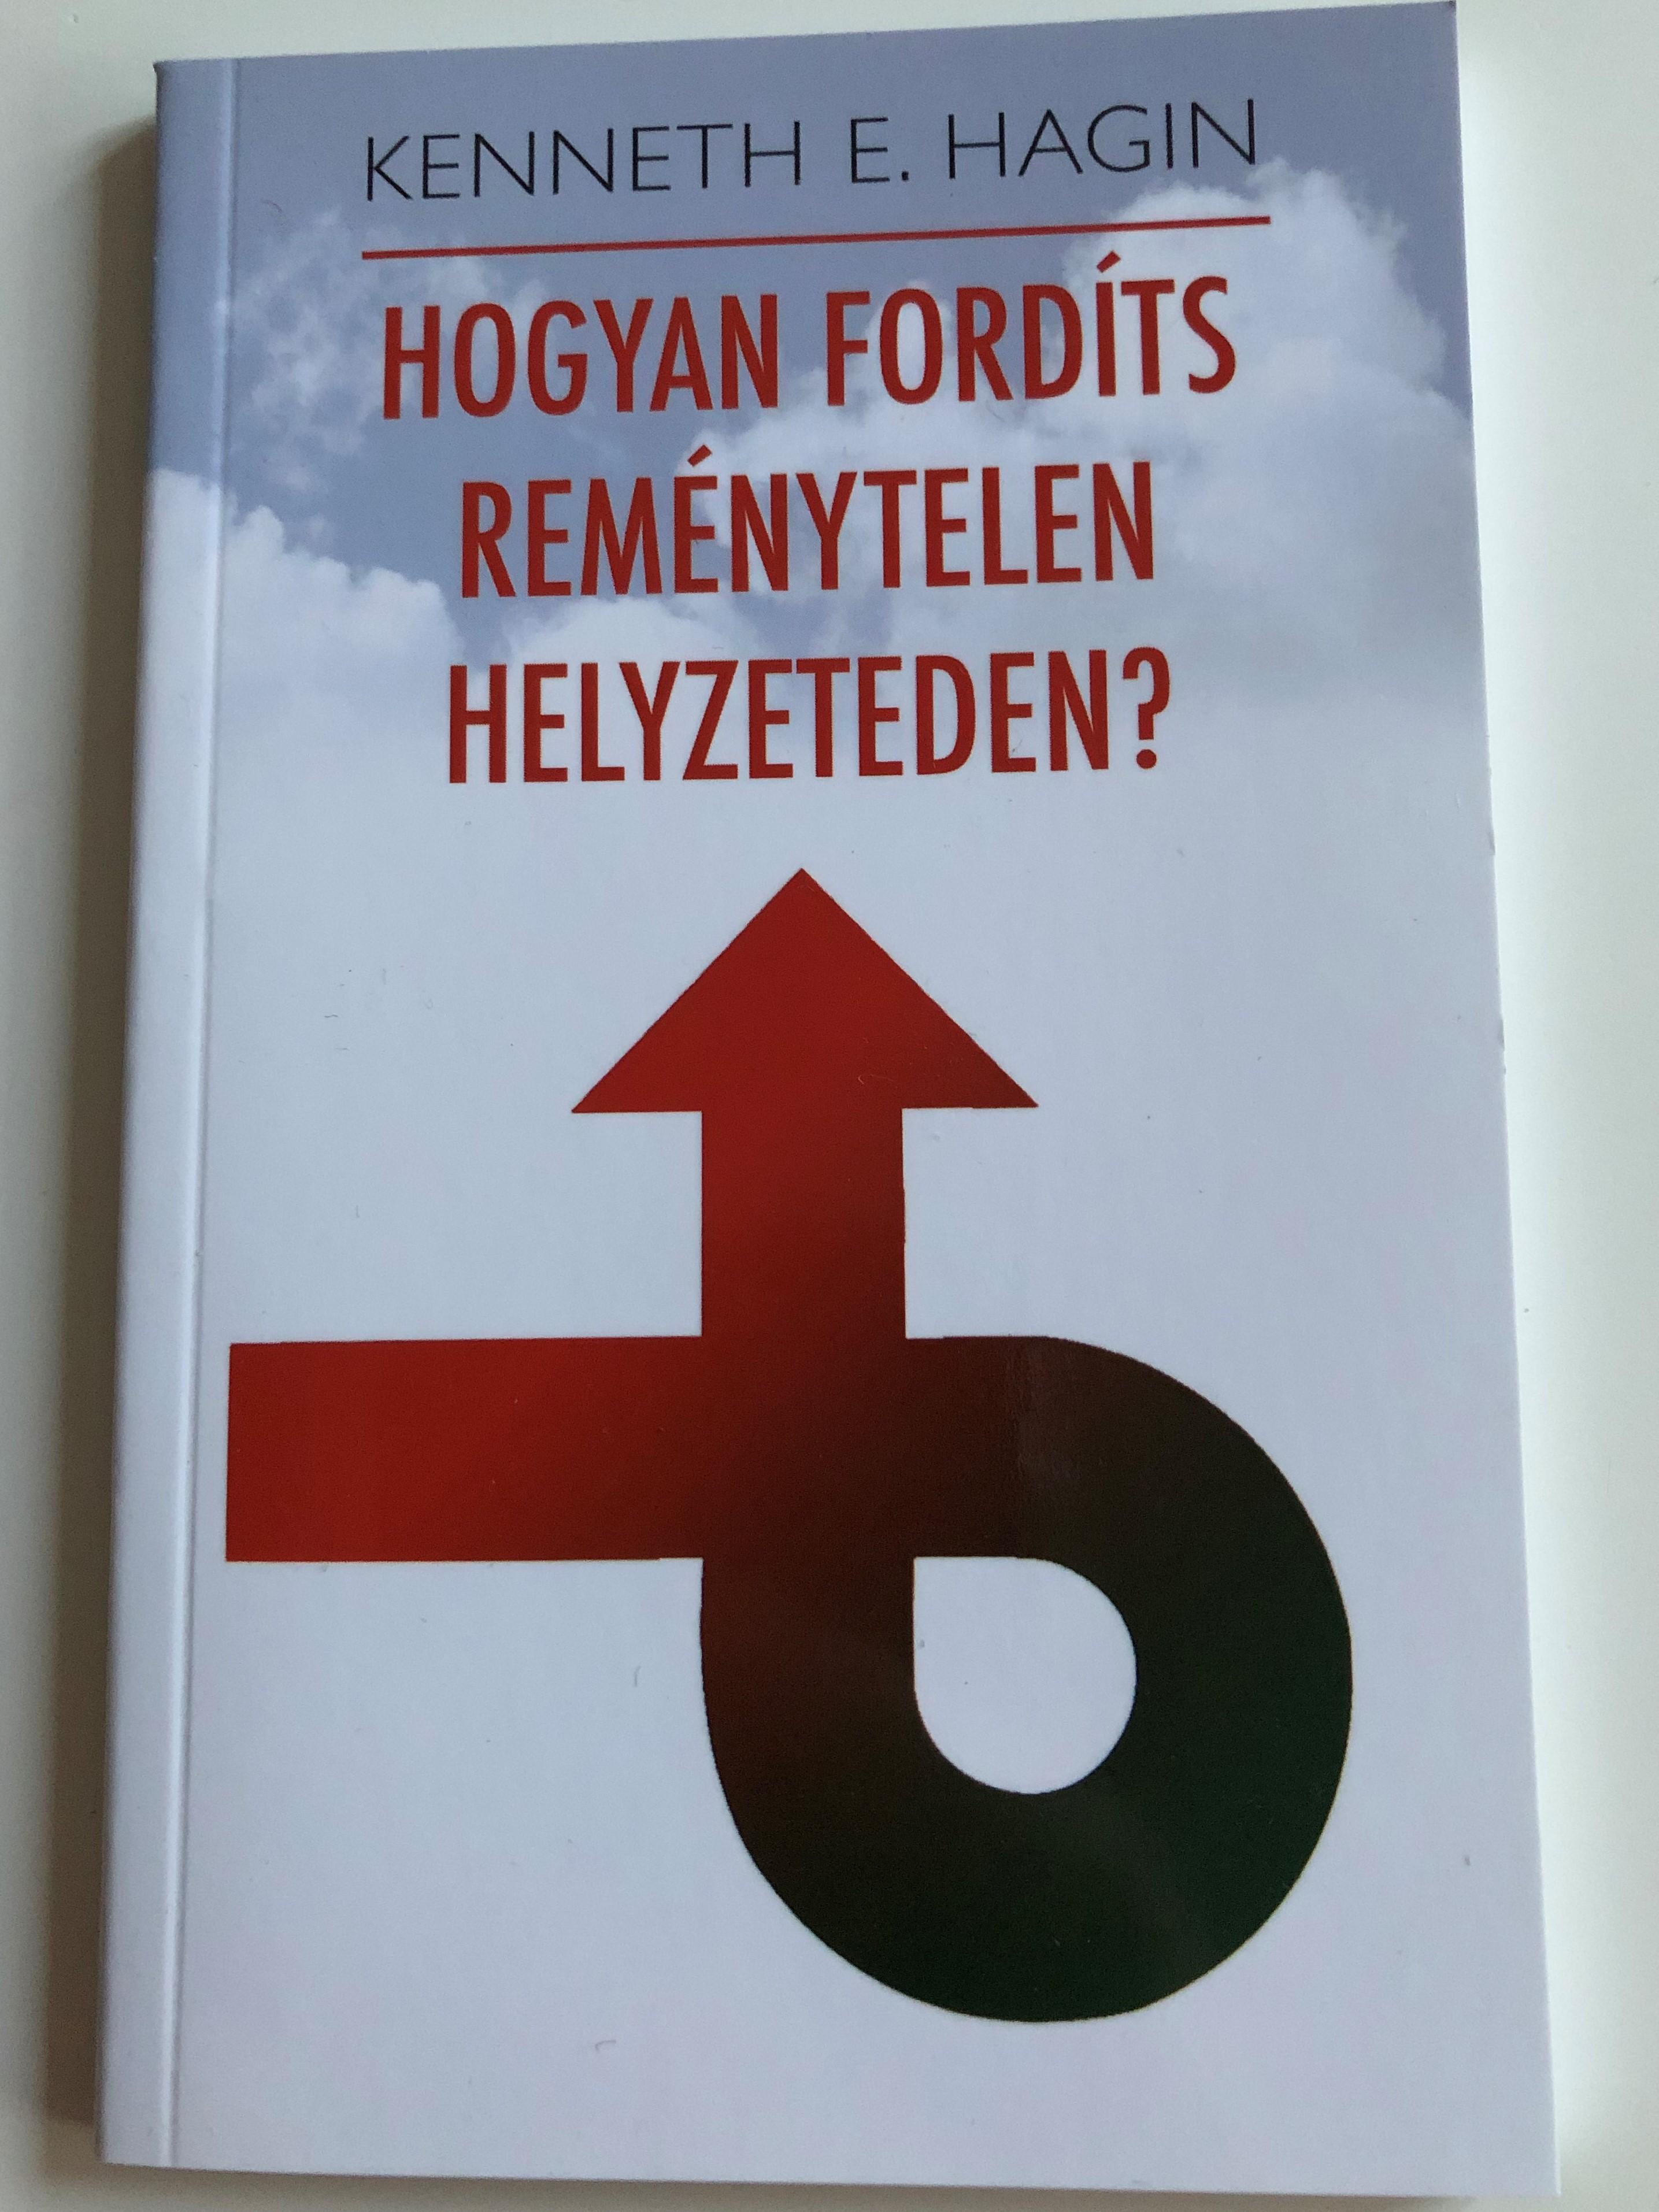 -hogyan-ford-ts-rem-nytelen-helyzeteden-by-kenneth-e.-hagin-hungarian-edition-of-turning-hopeless-situation-around-1-.jpg